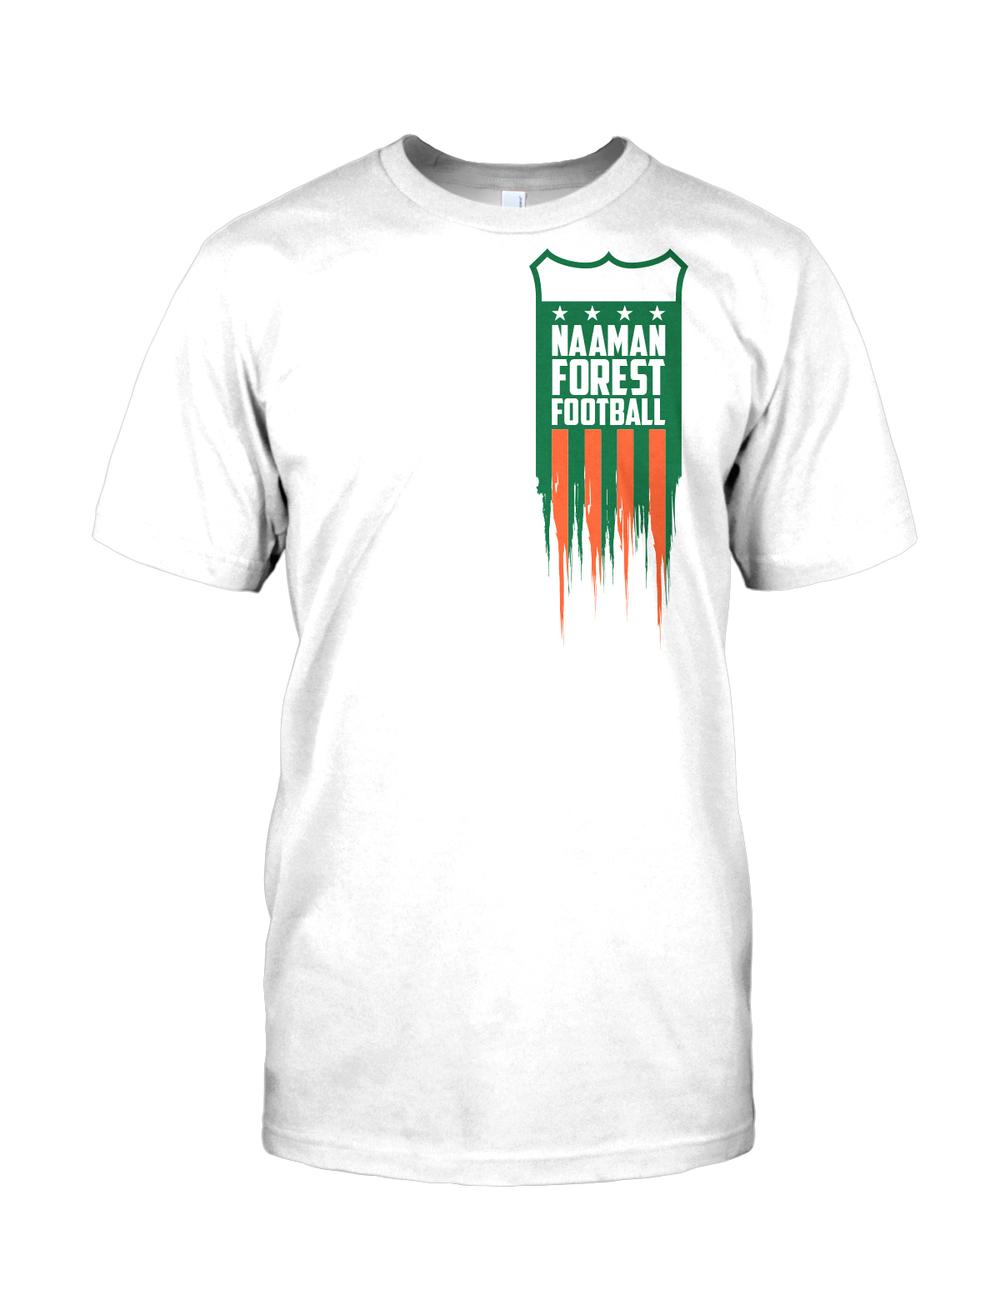 Tee-Design-Shirt3_o.jpg